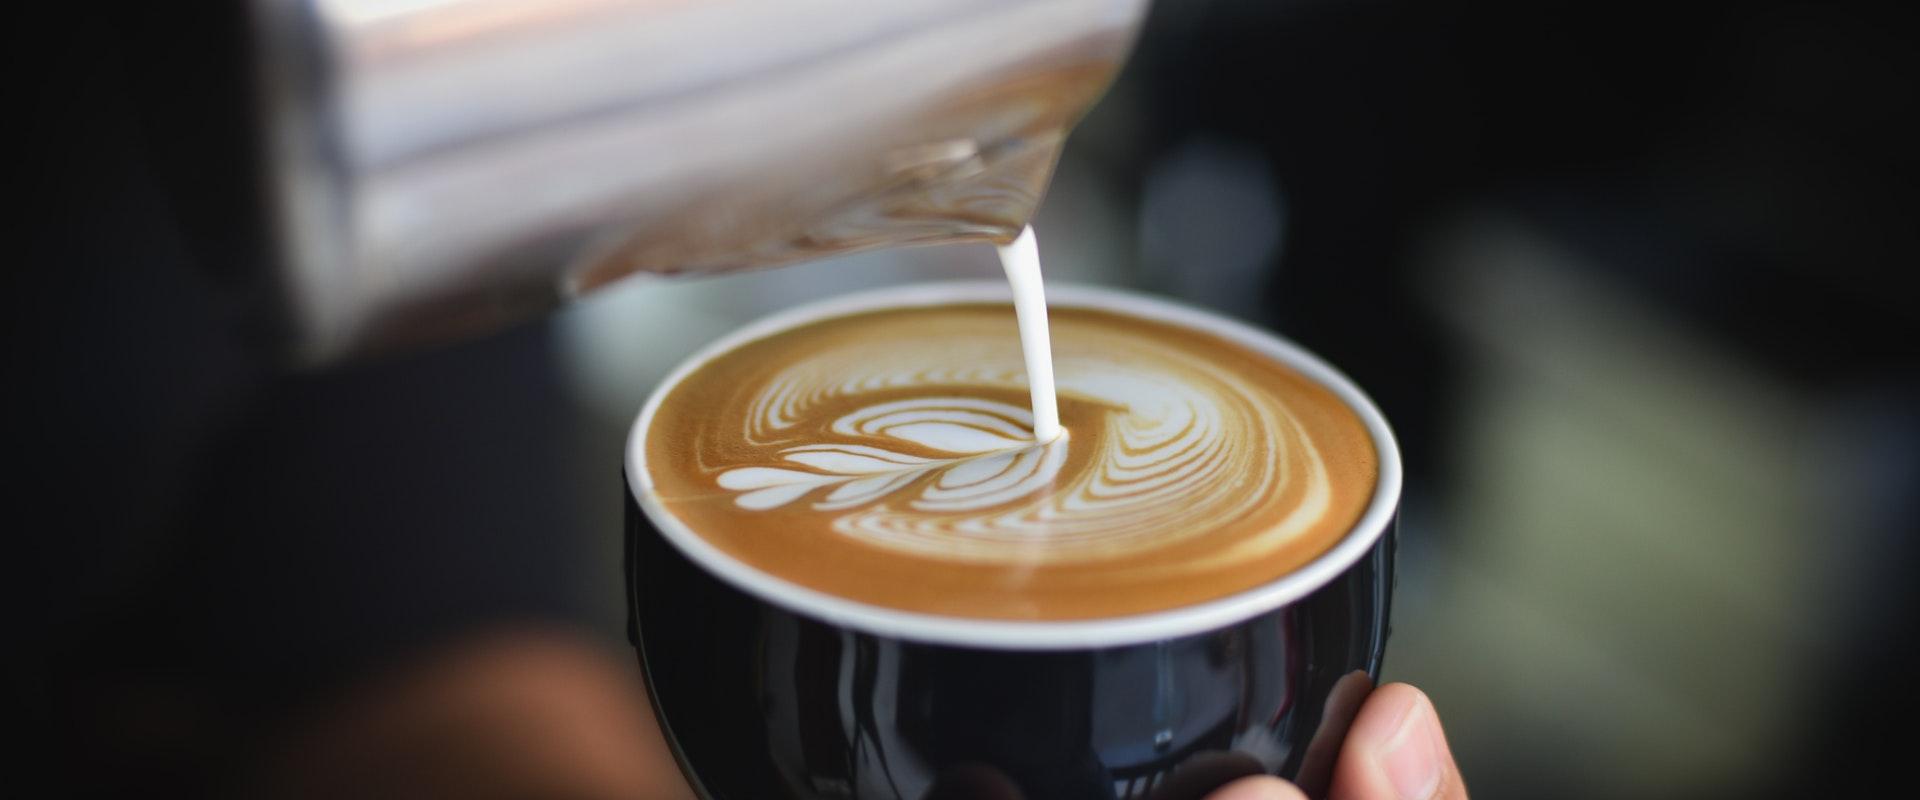 FREE COFFEE COACHING SERVIES